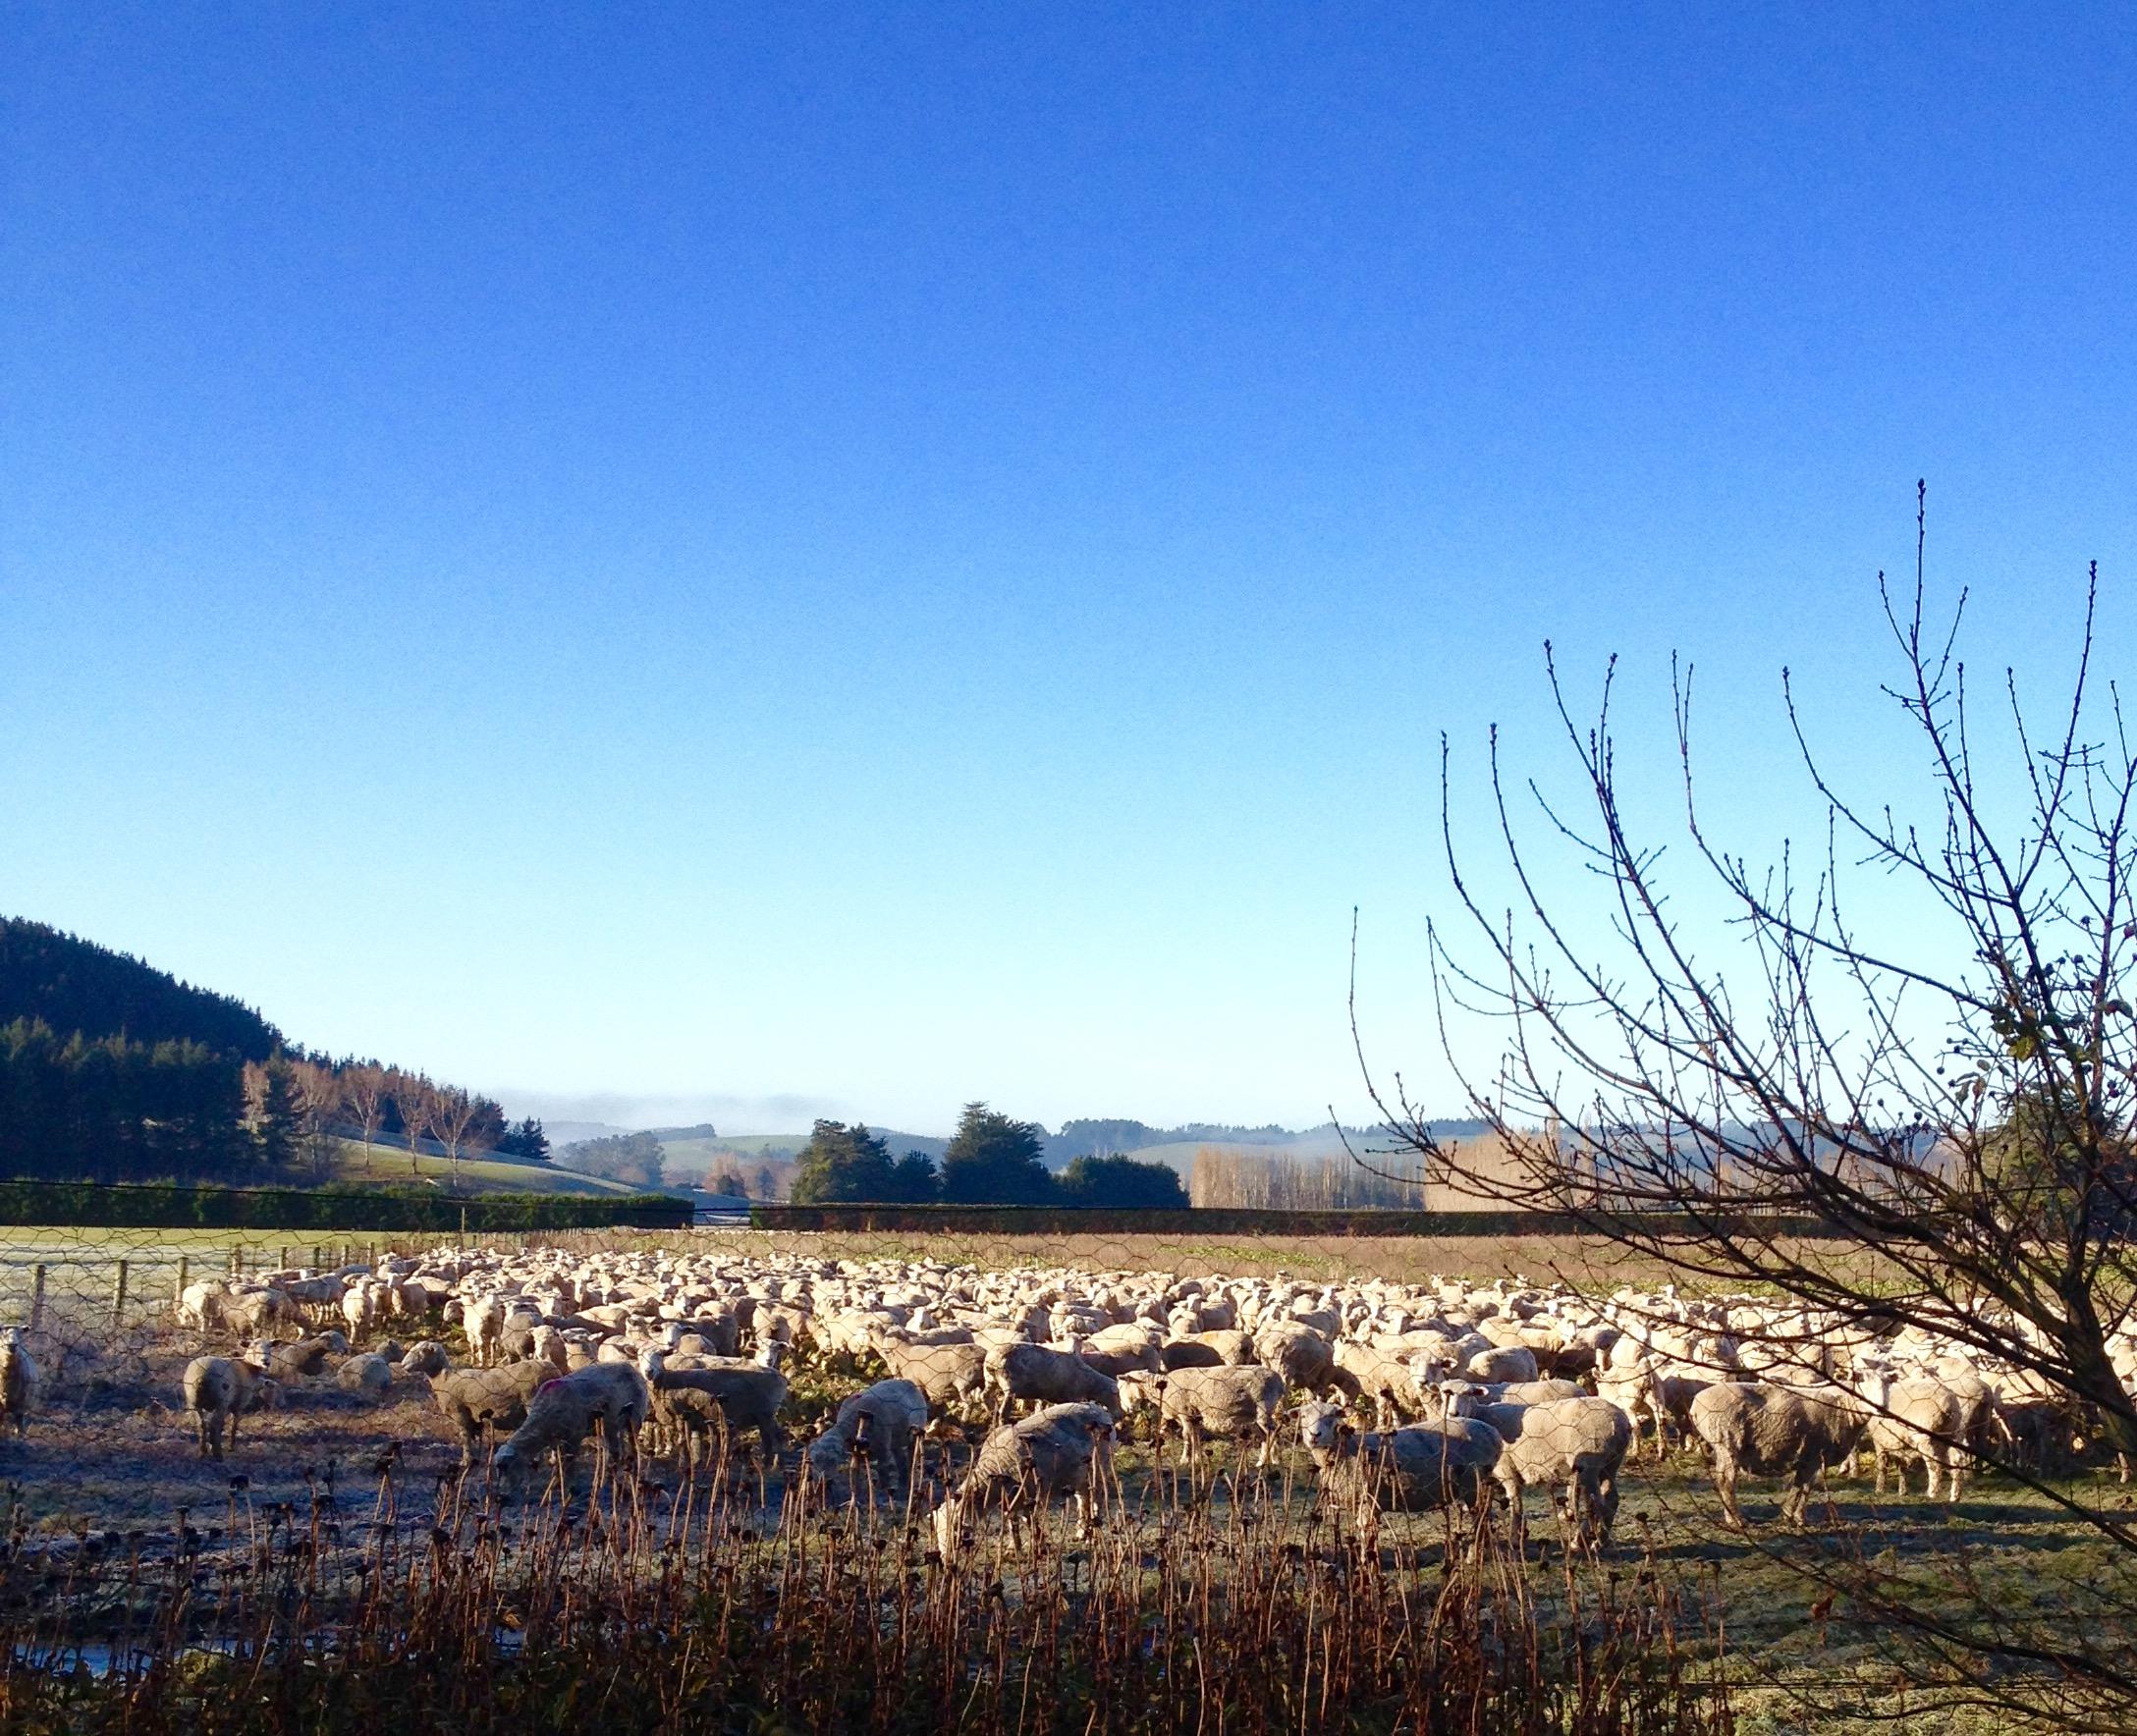 mob of sheep